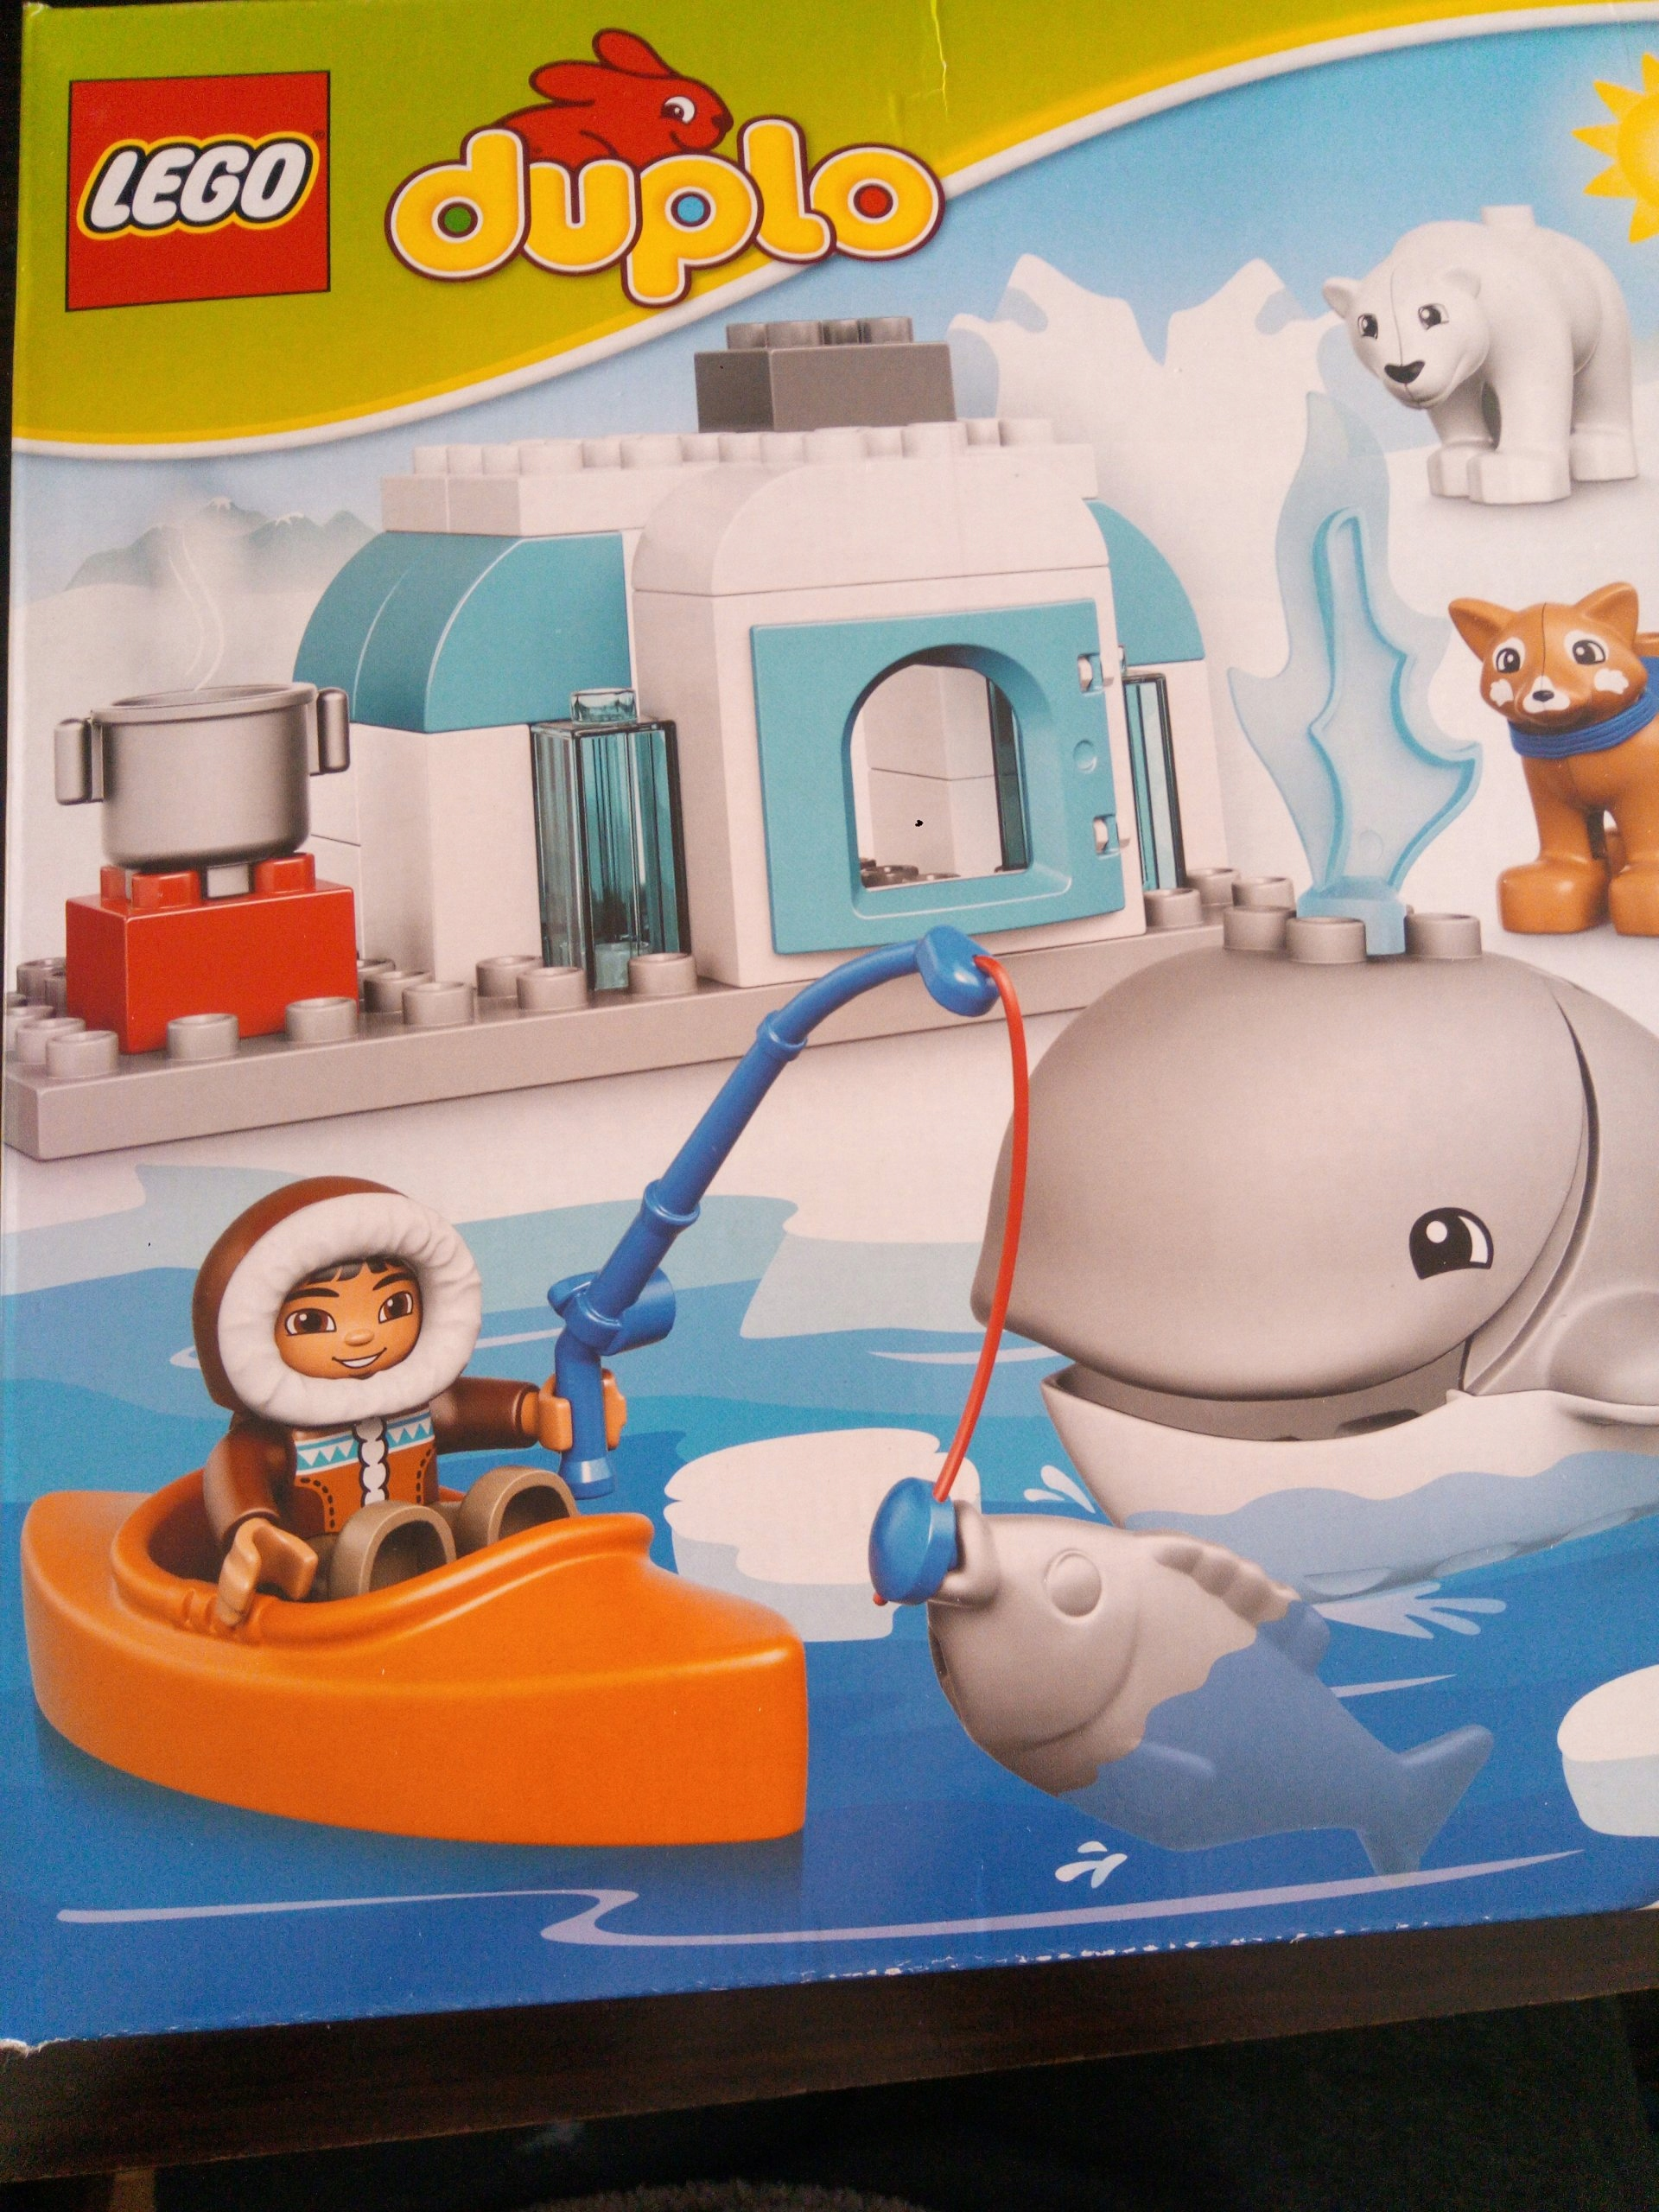 Lego Duplo 10803 Arktyka Nowe 7179910074 Oficjalne Archiwum Allegro